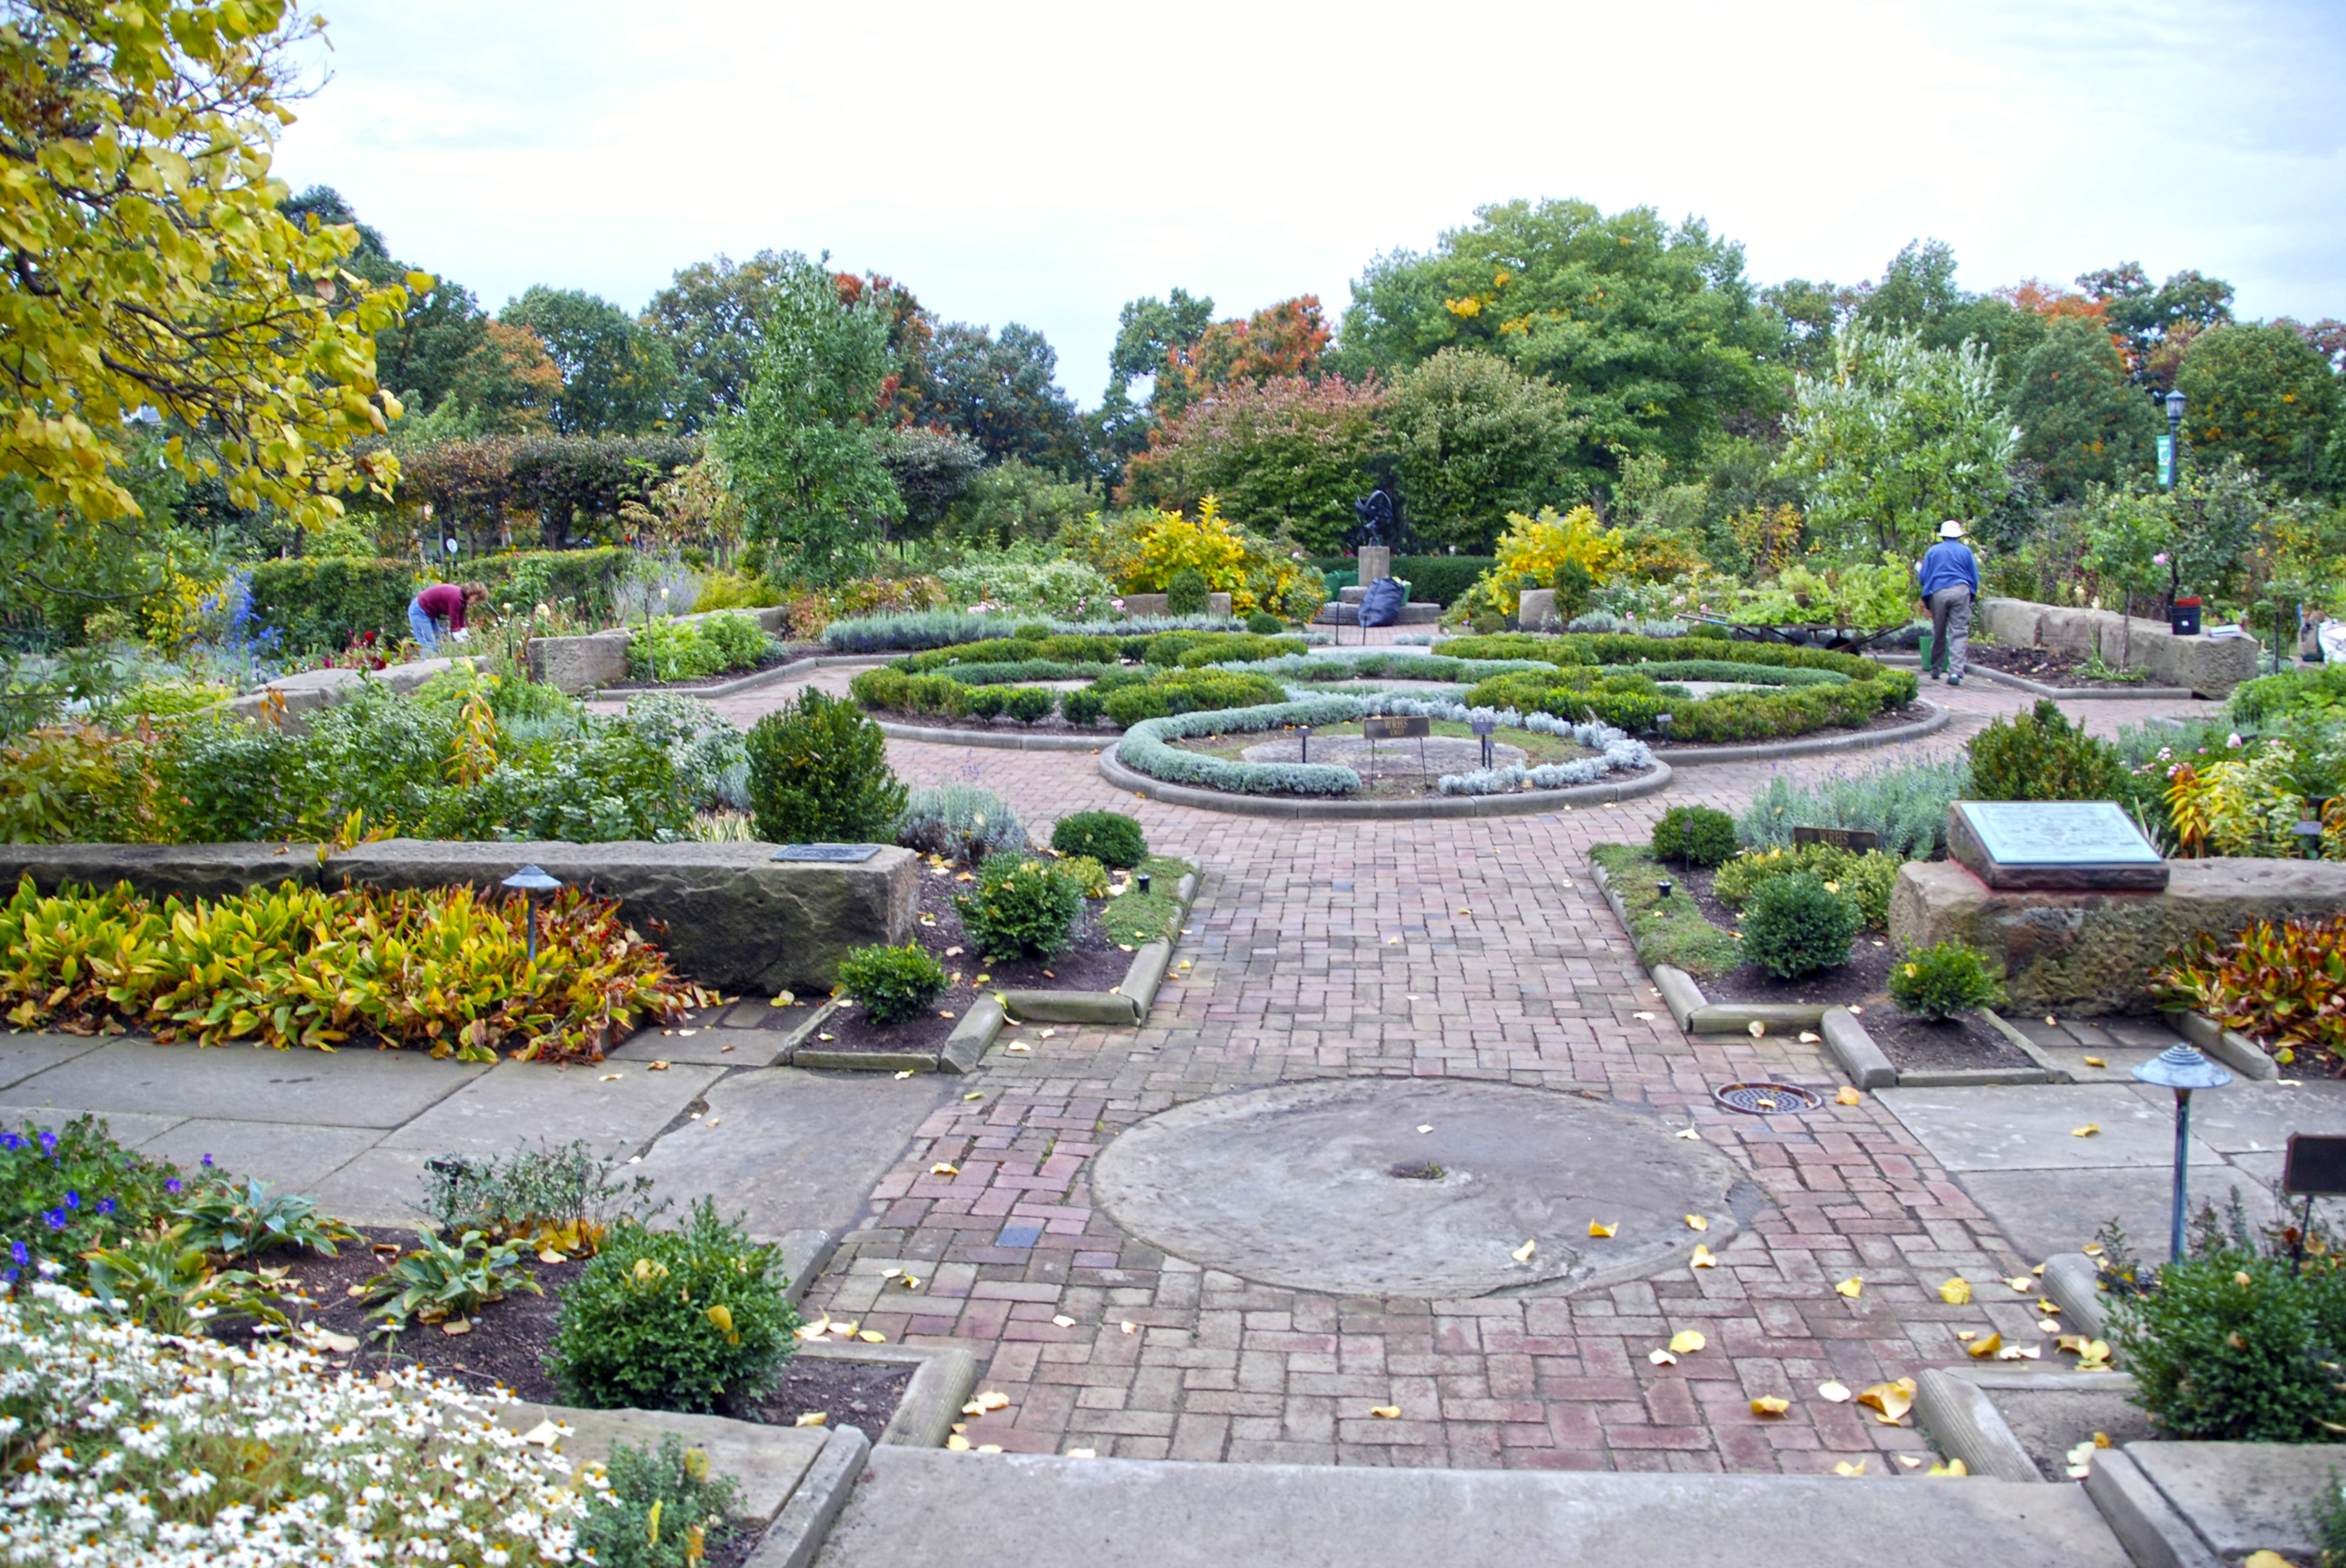 Knot and Fragrance Garden - November